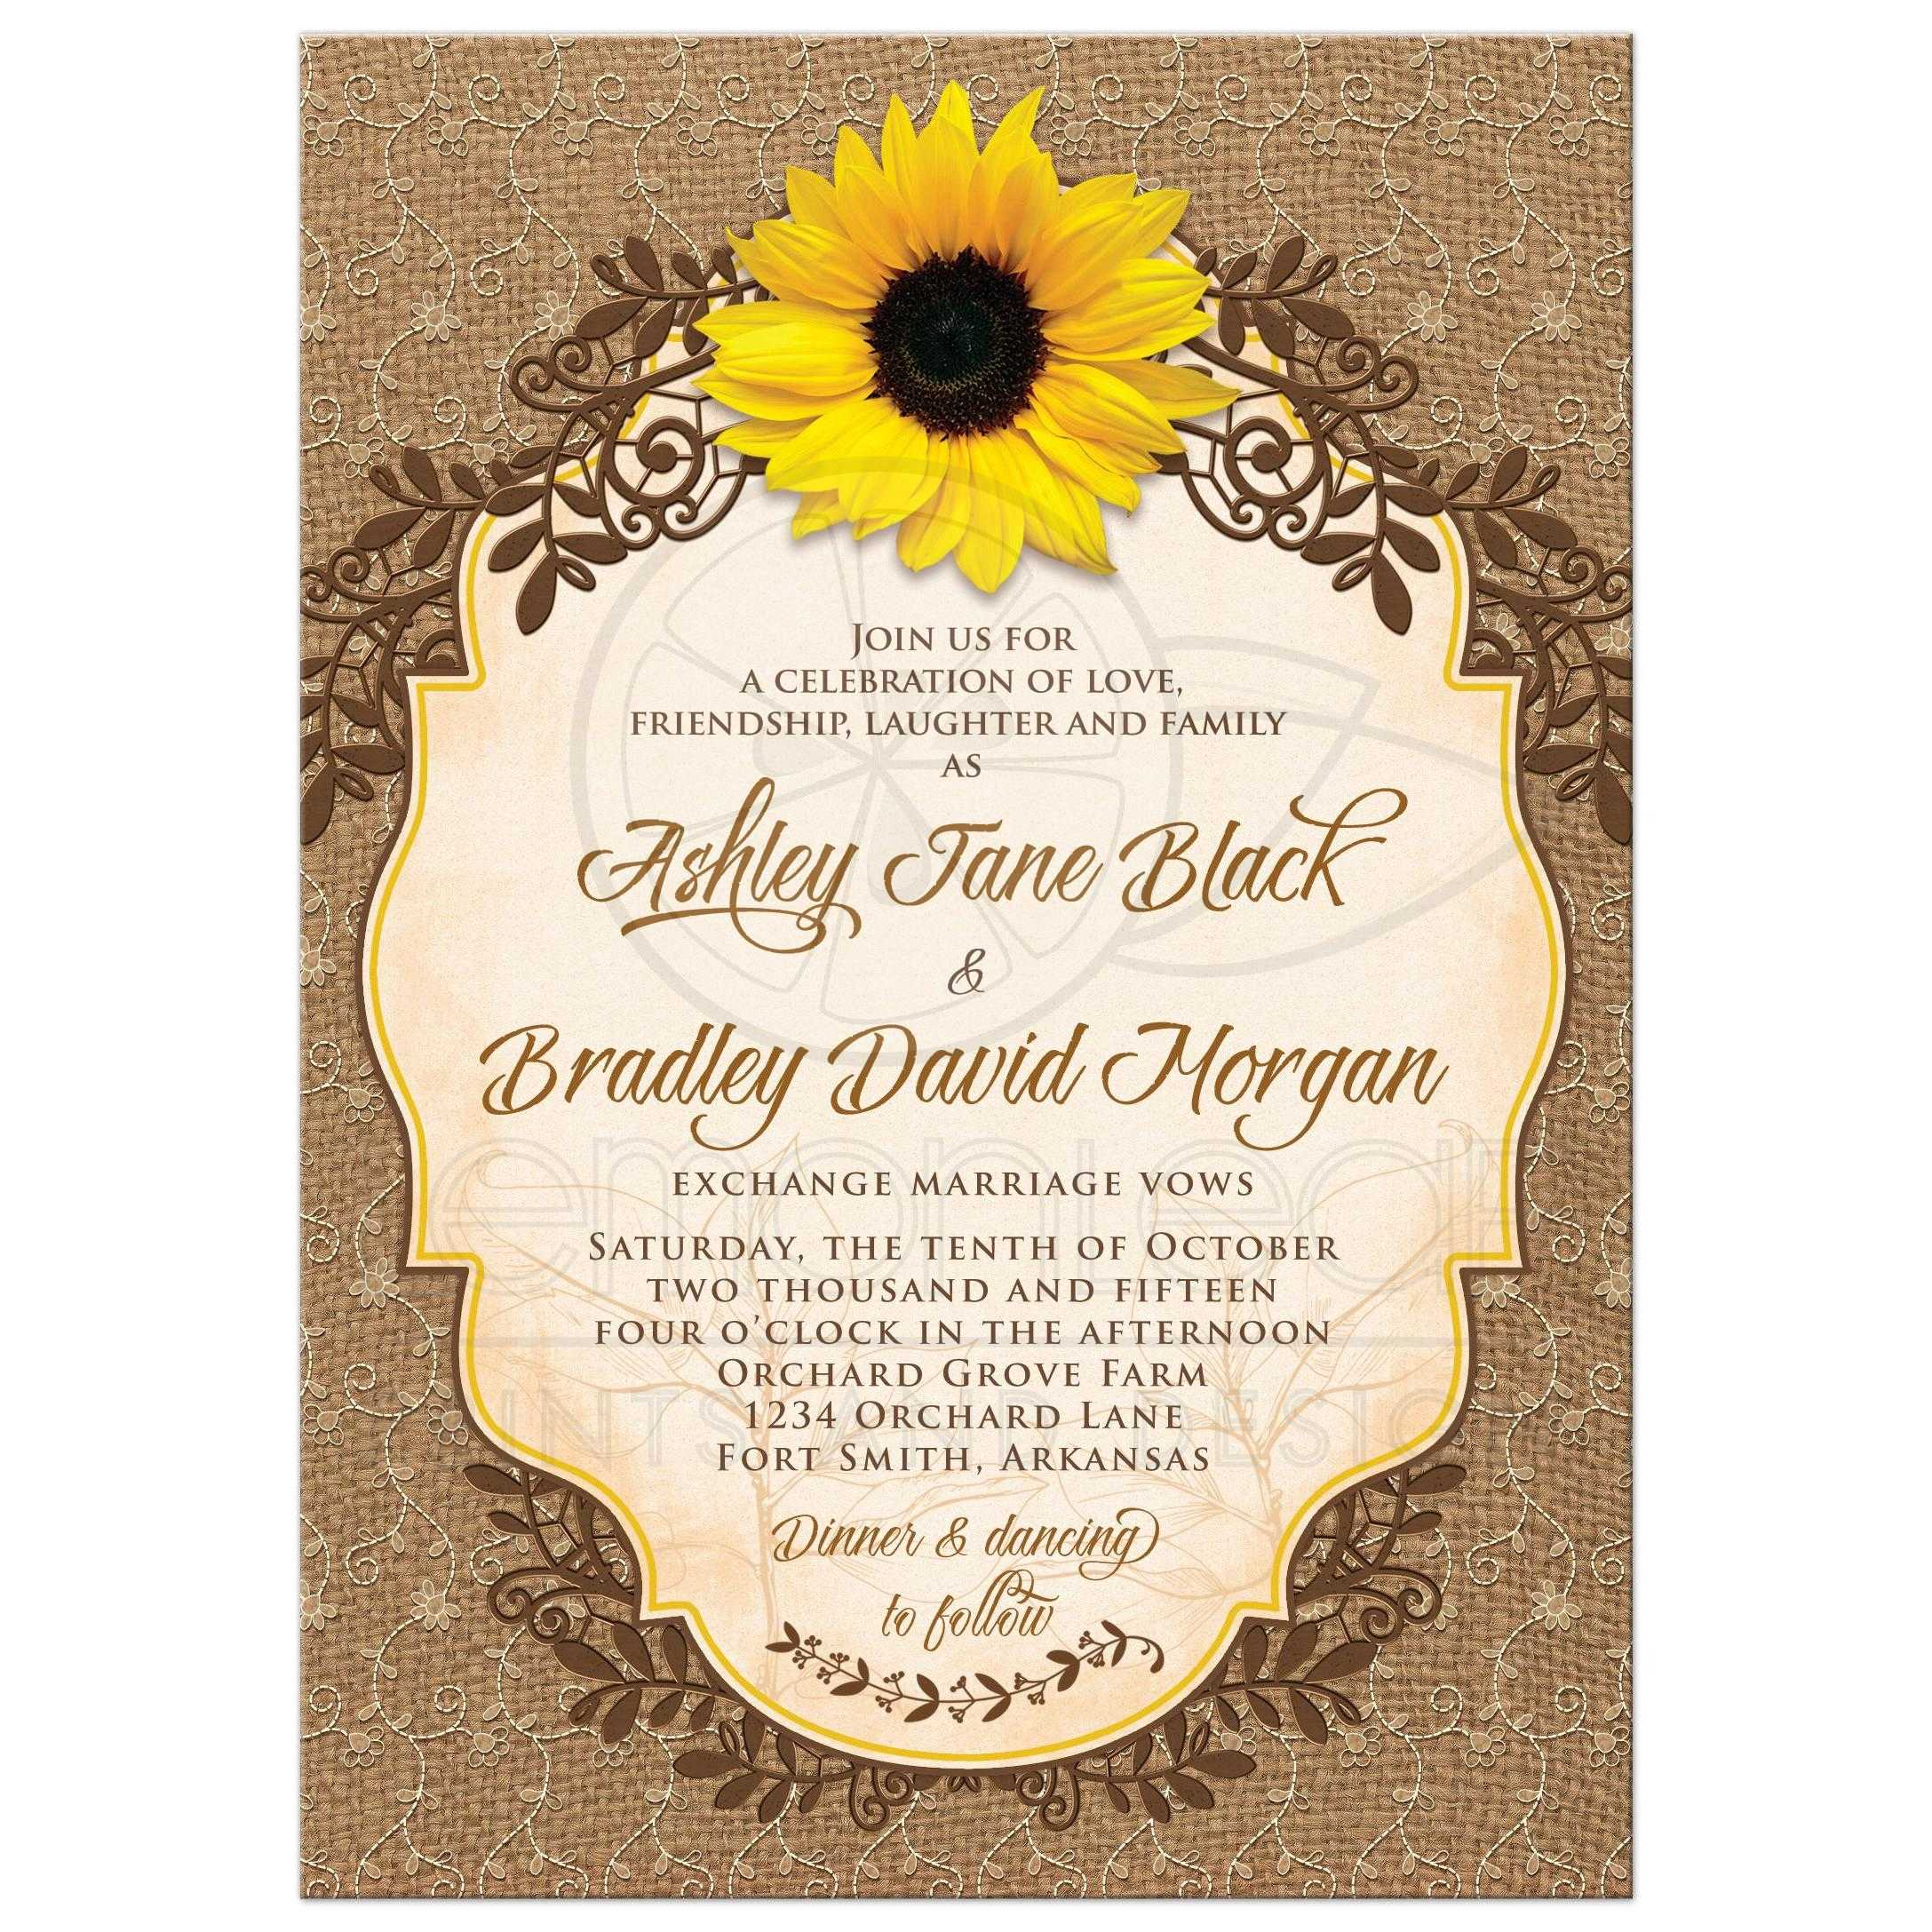 Burlap Invitations Wedding: Sunflower Wedding Invitation Rustic Burlap And Lace Floral